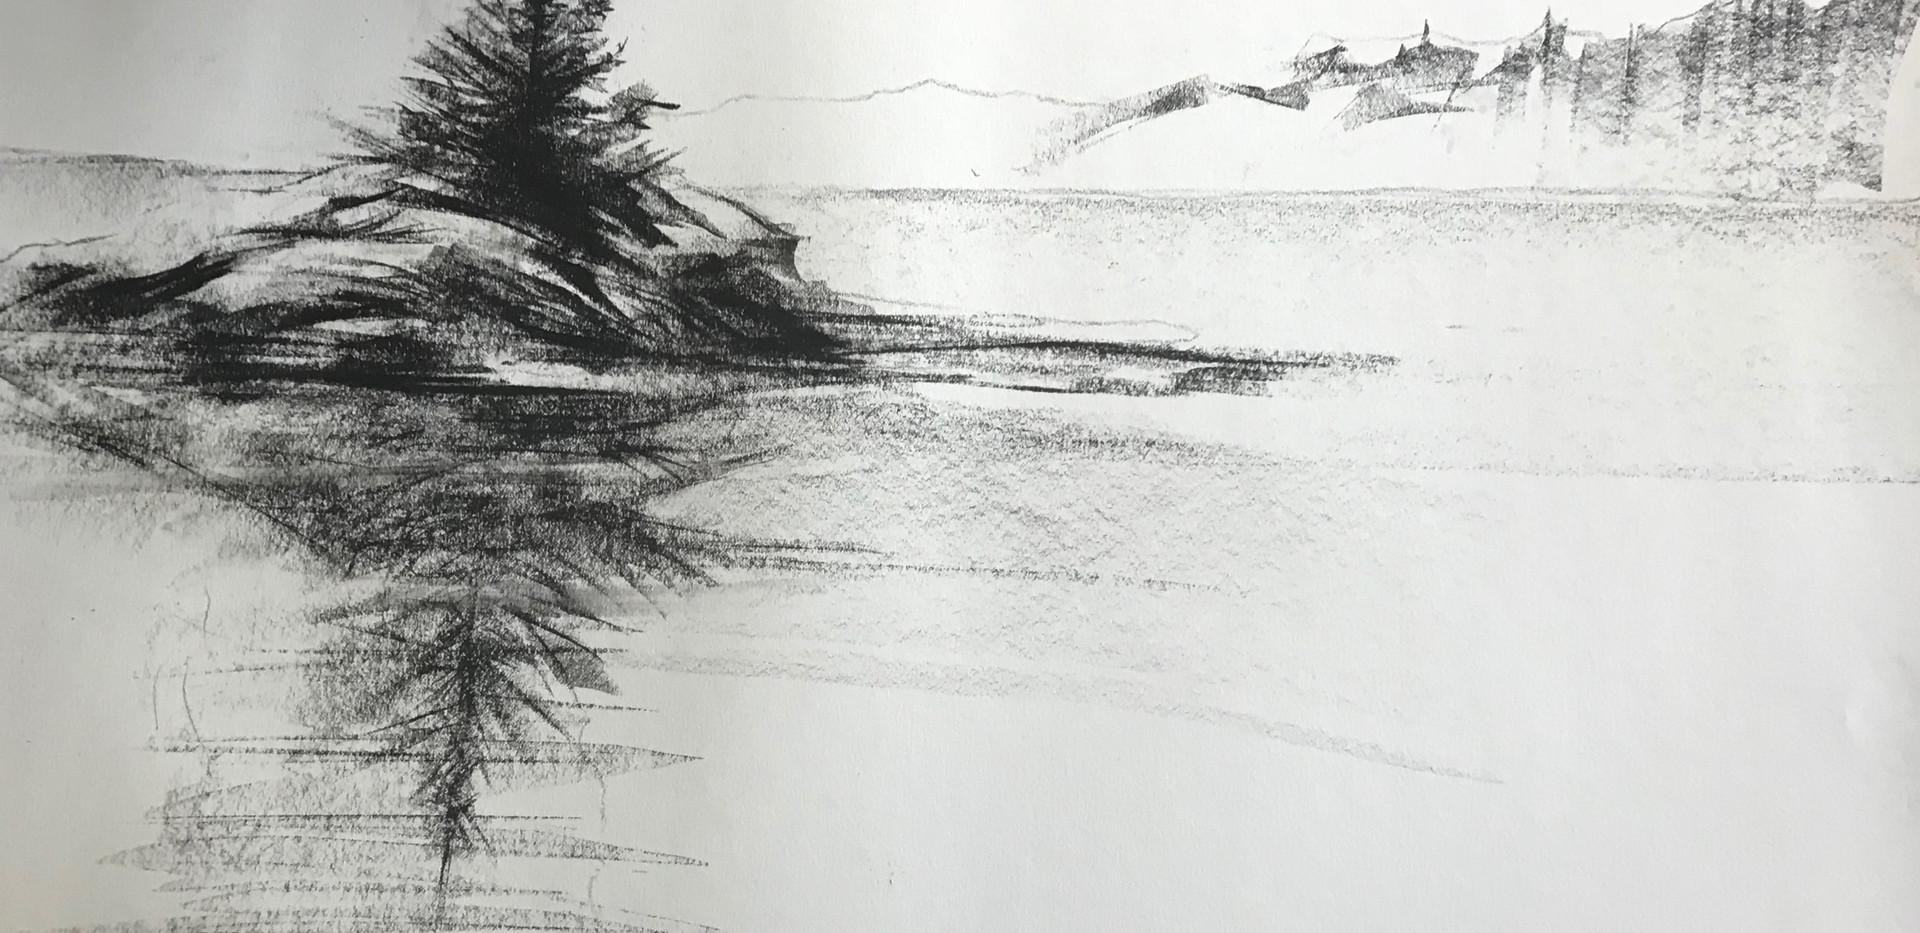 Fish Hawk Island